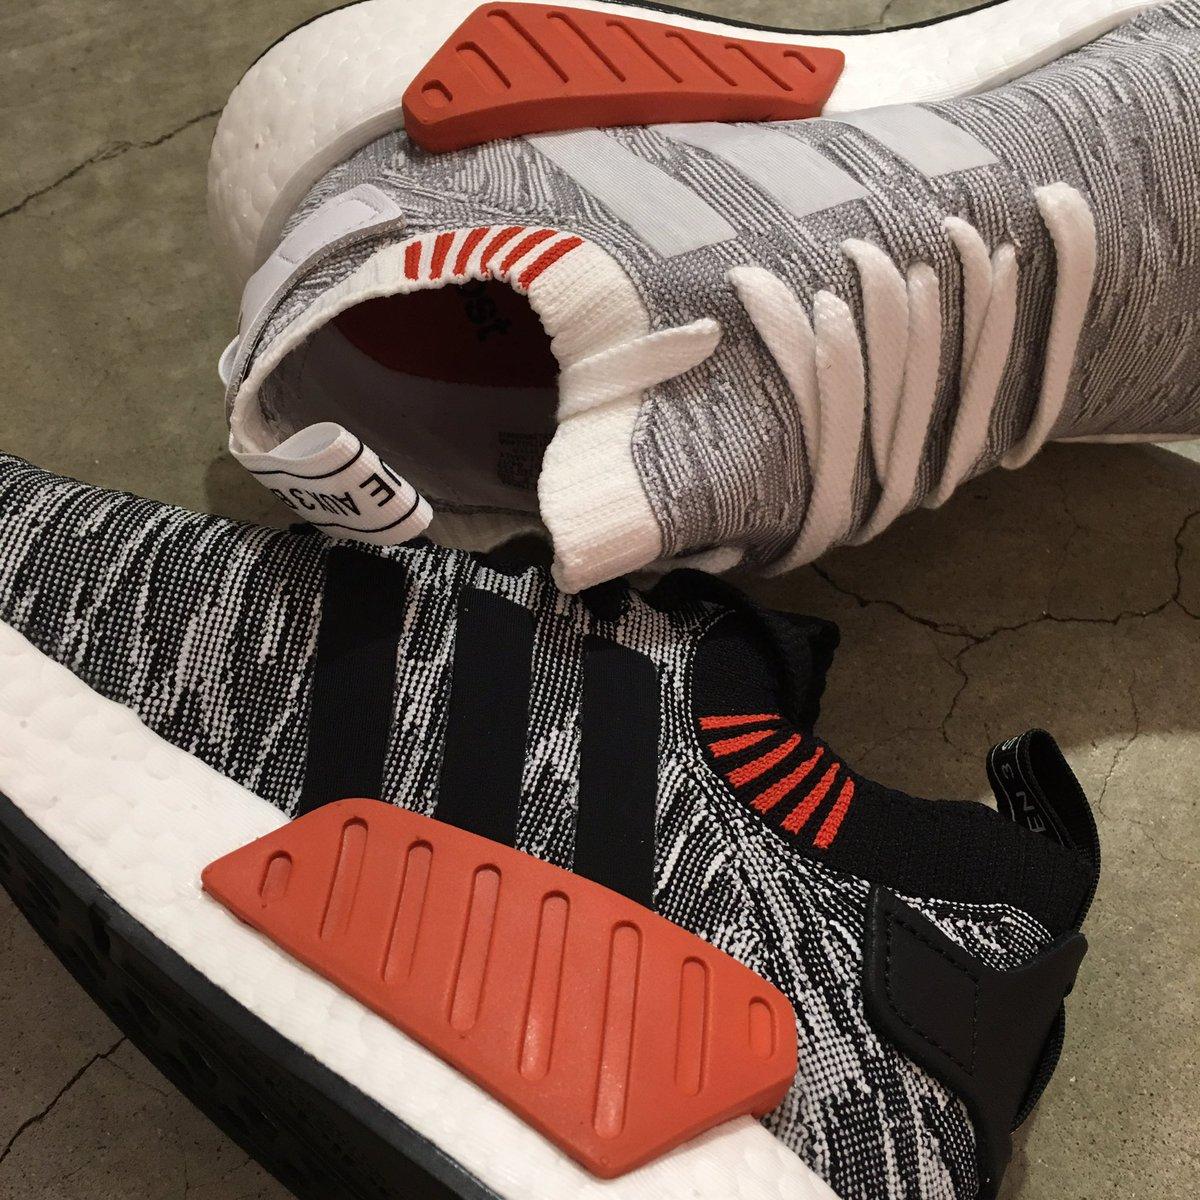 Cheap Adidas NMD R2 Shoes, Fake Adidas